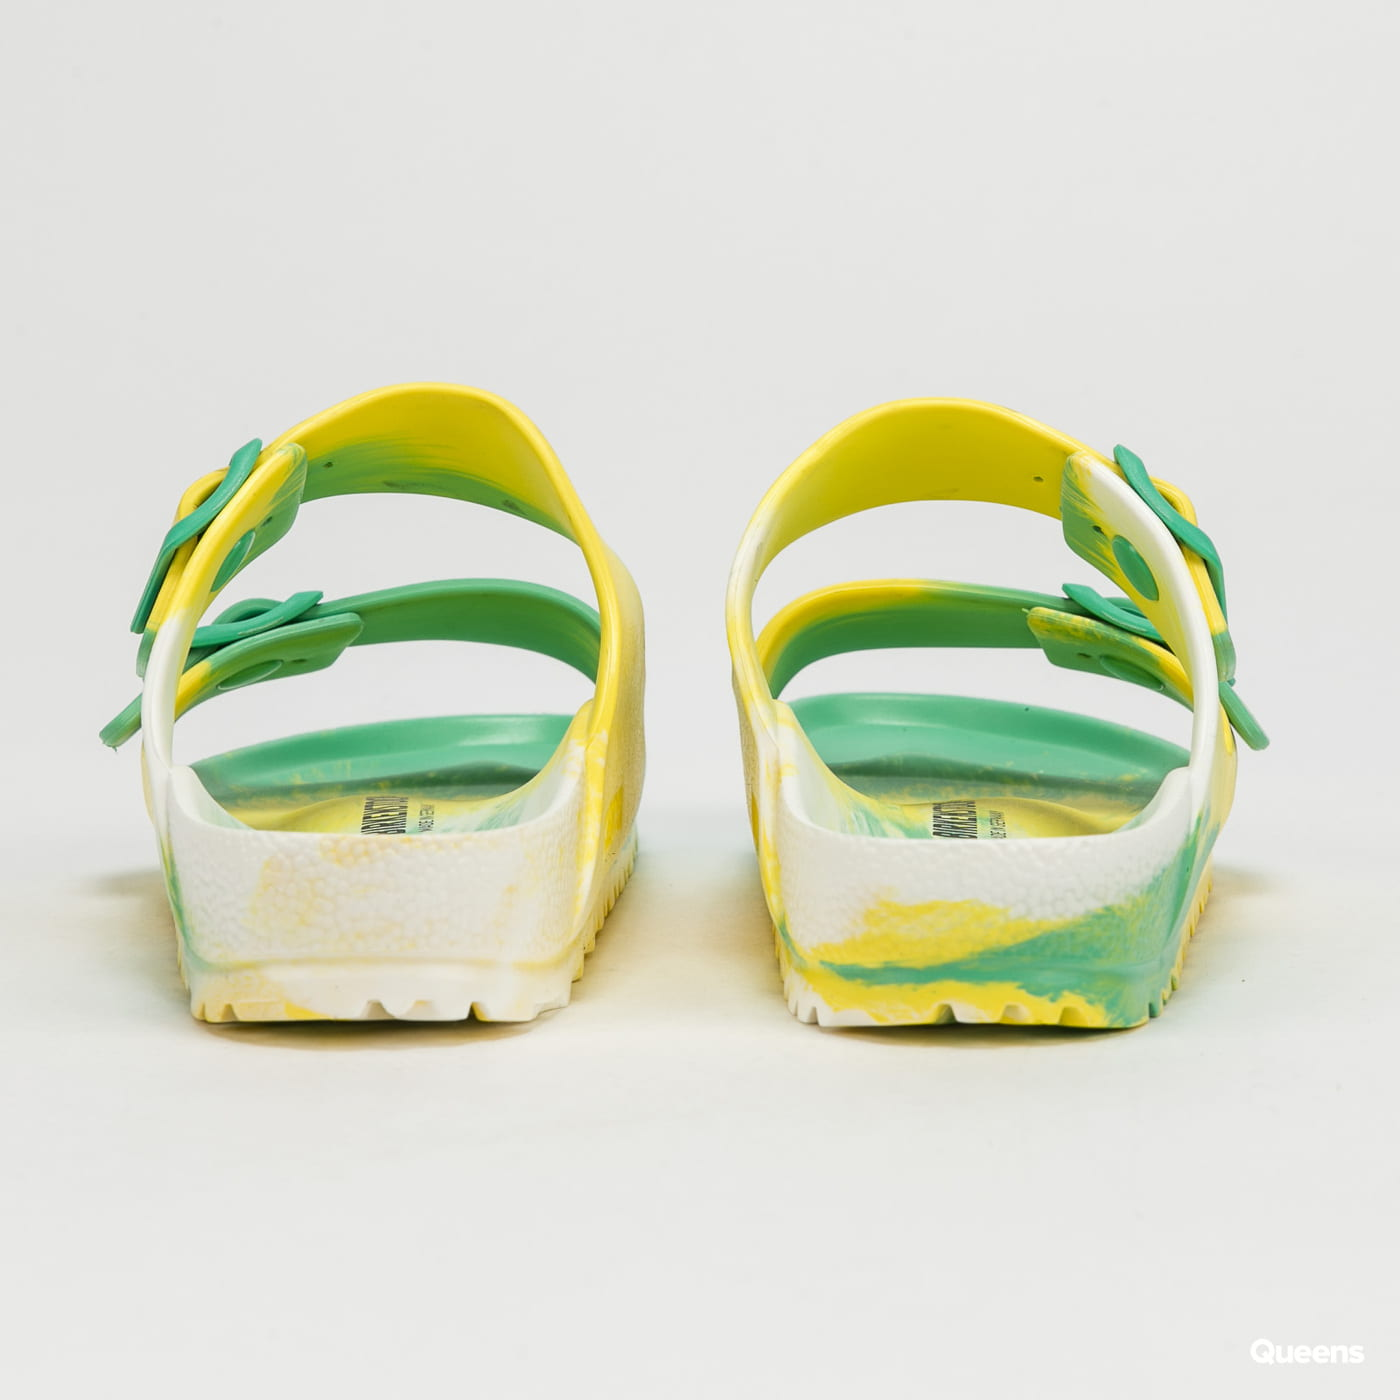 BIRKENSTOCK Arizona EVA milti color jade / vibrant yellow / whi